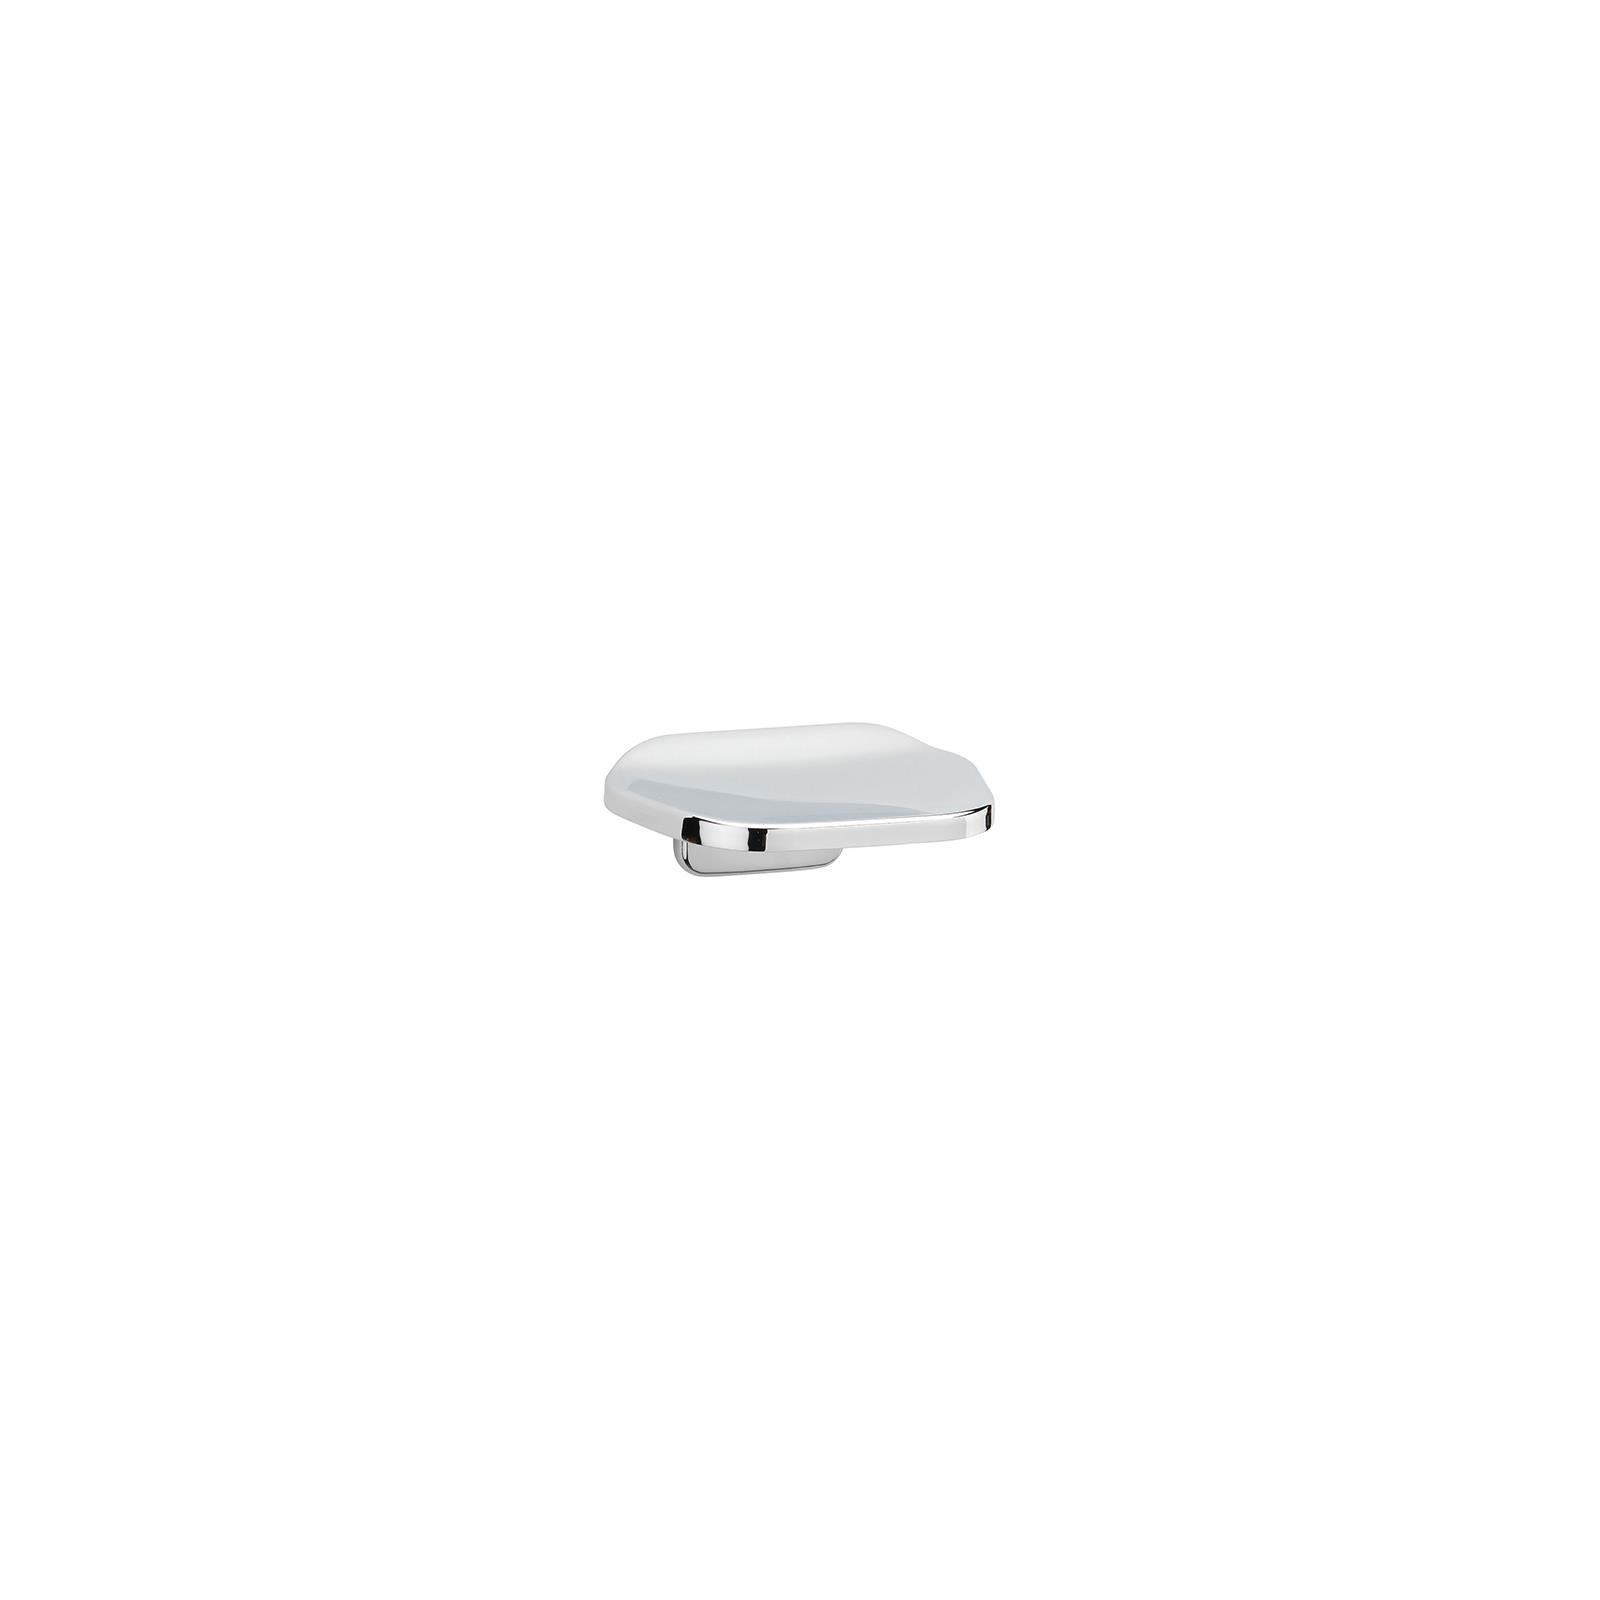 Baypointe Homewerks Worldwide-Import 180822 Soap Dish, Chrome - Quantity 6